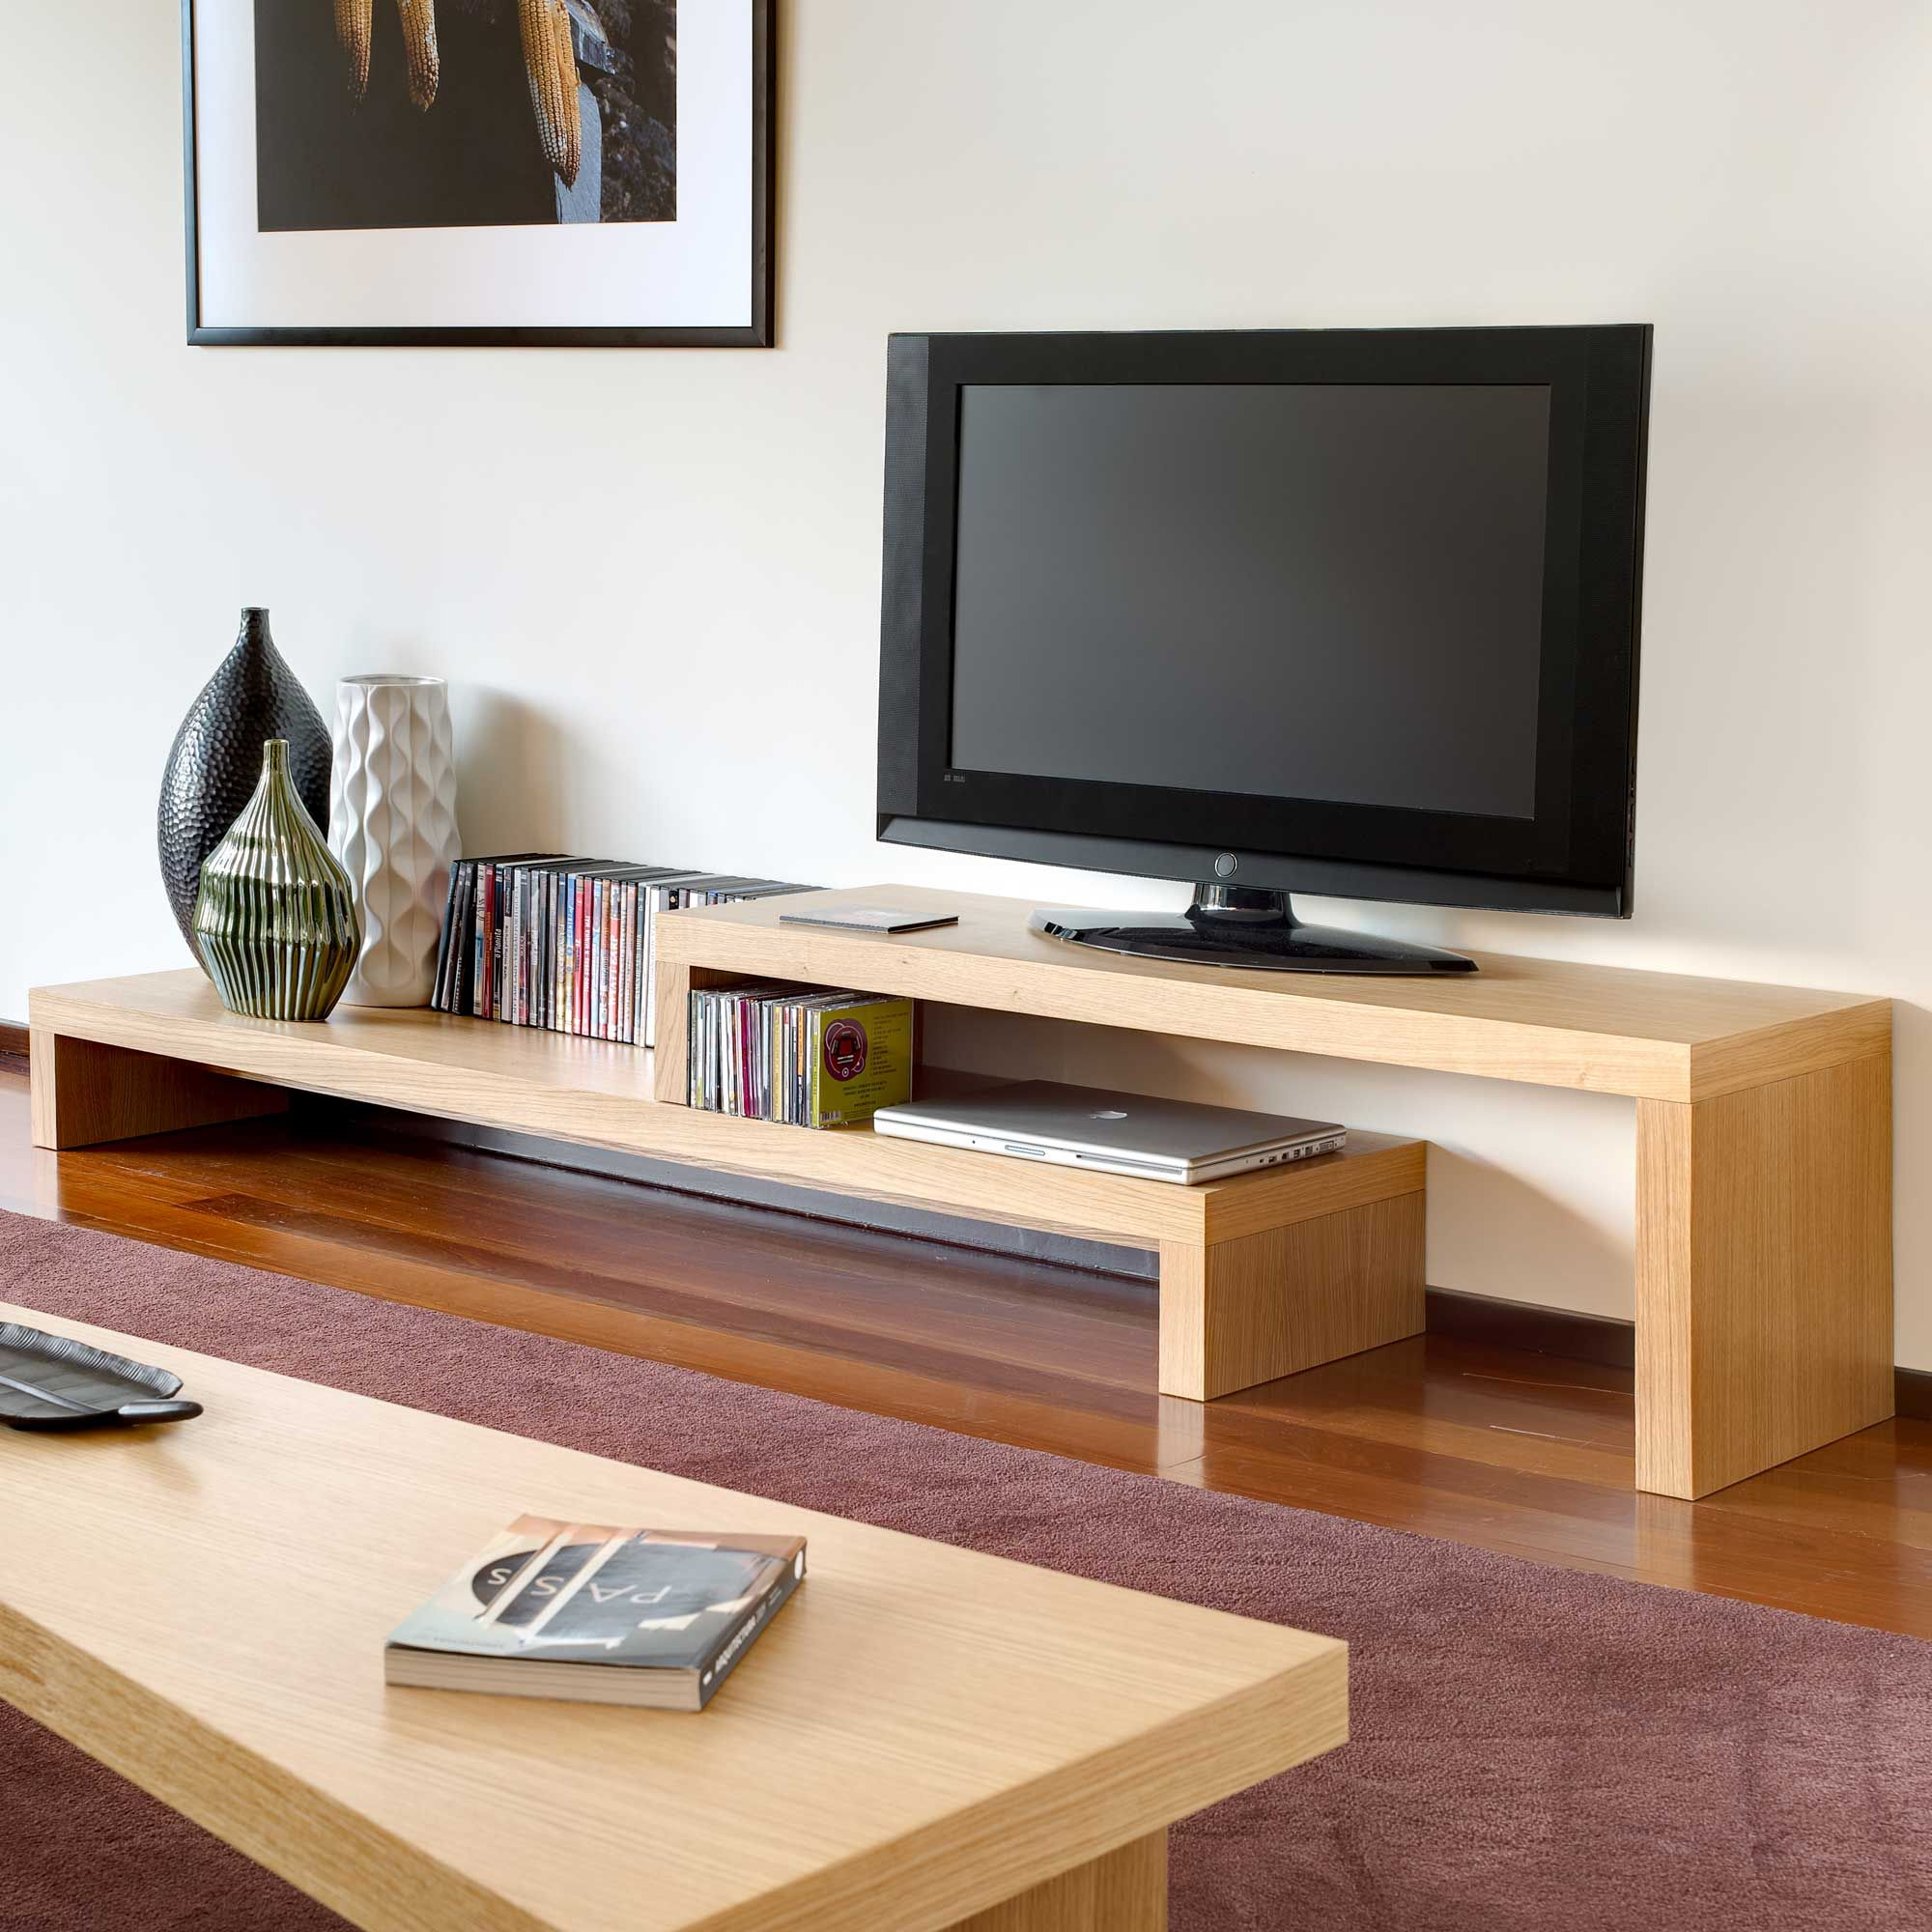 modele de meuble tv en bois